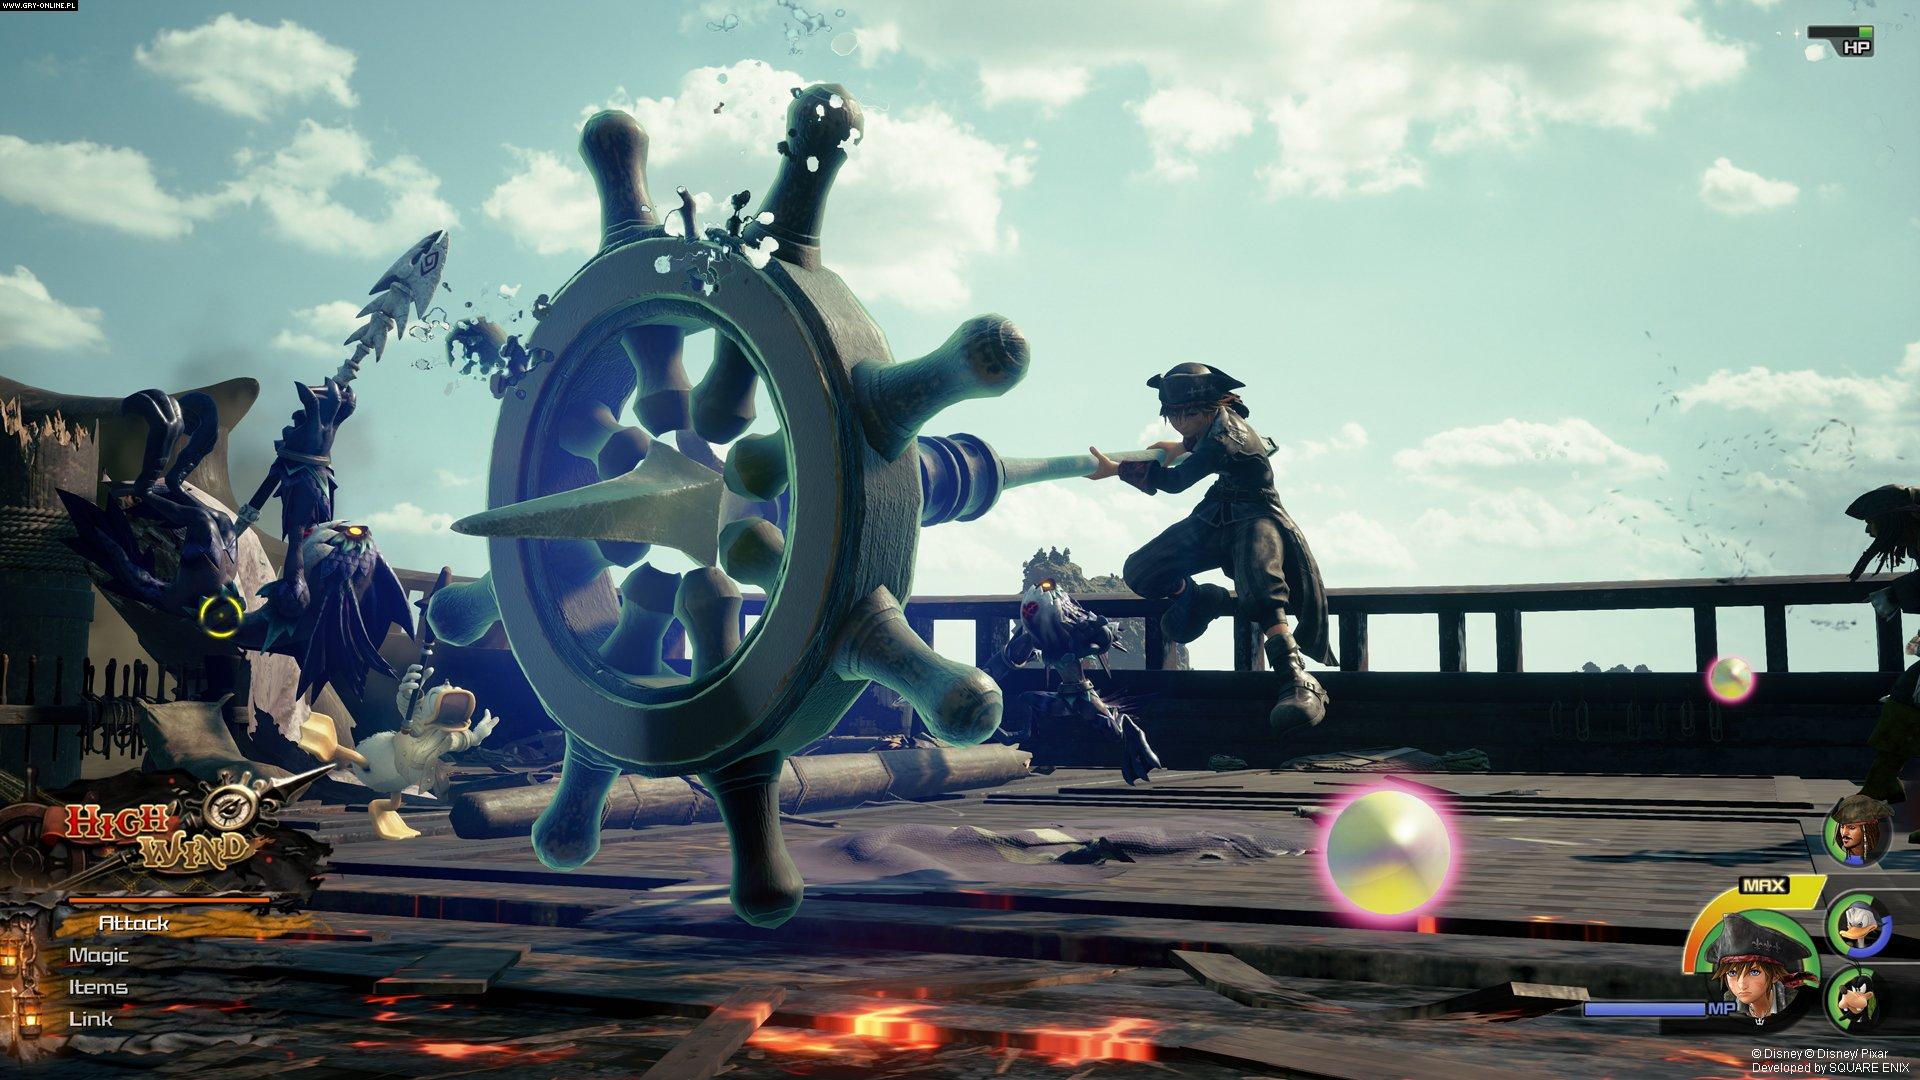 Kingdom Hearts III PS4, XONE Games Image 105/191, Square-Enix / Eidos